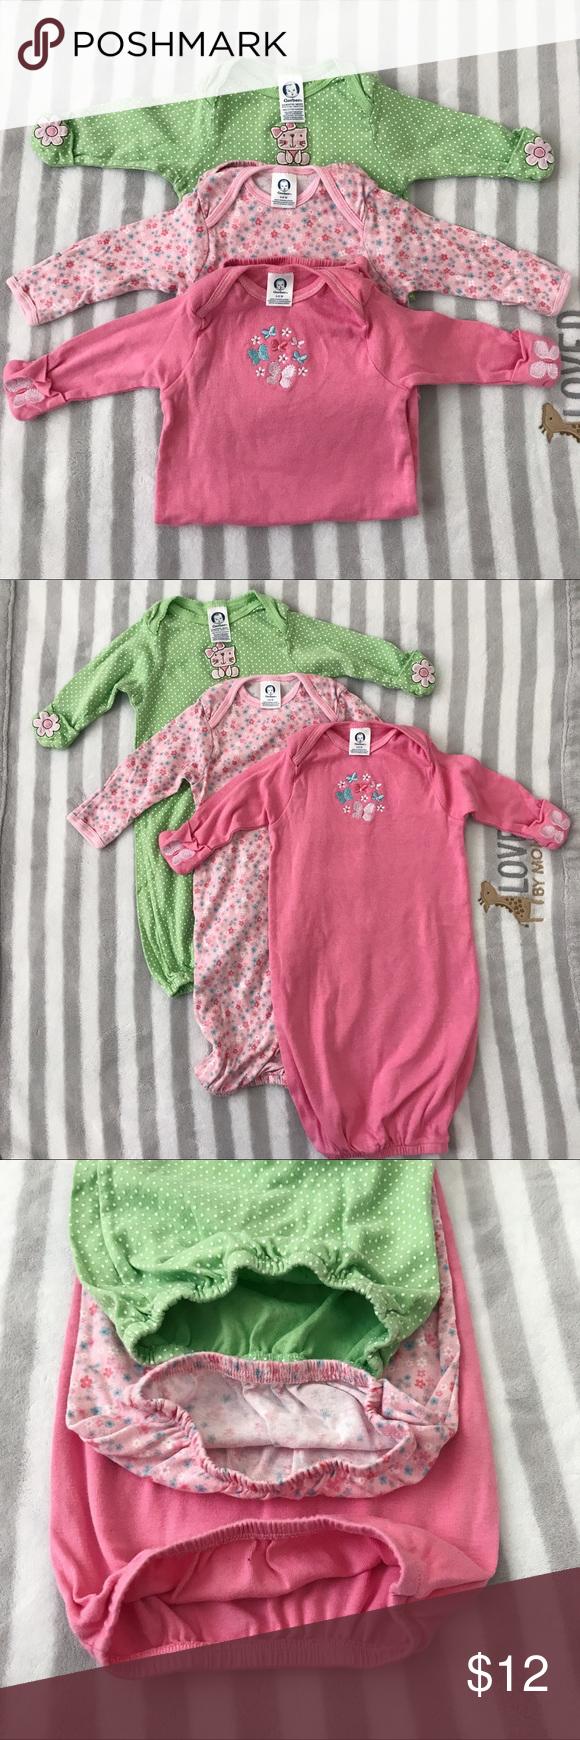 💐Gerber 0-6M Baby Nightgown Bundle Three Gerber baby nightgowns ...